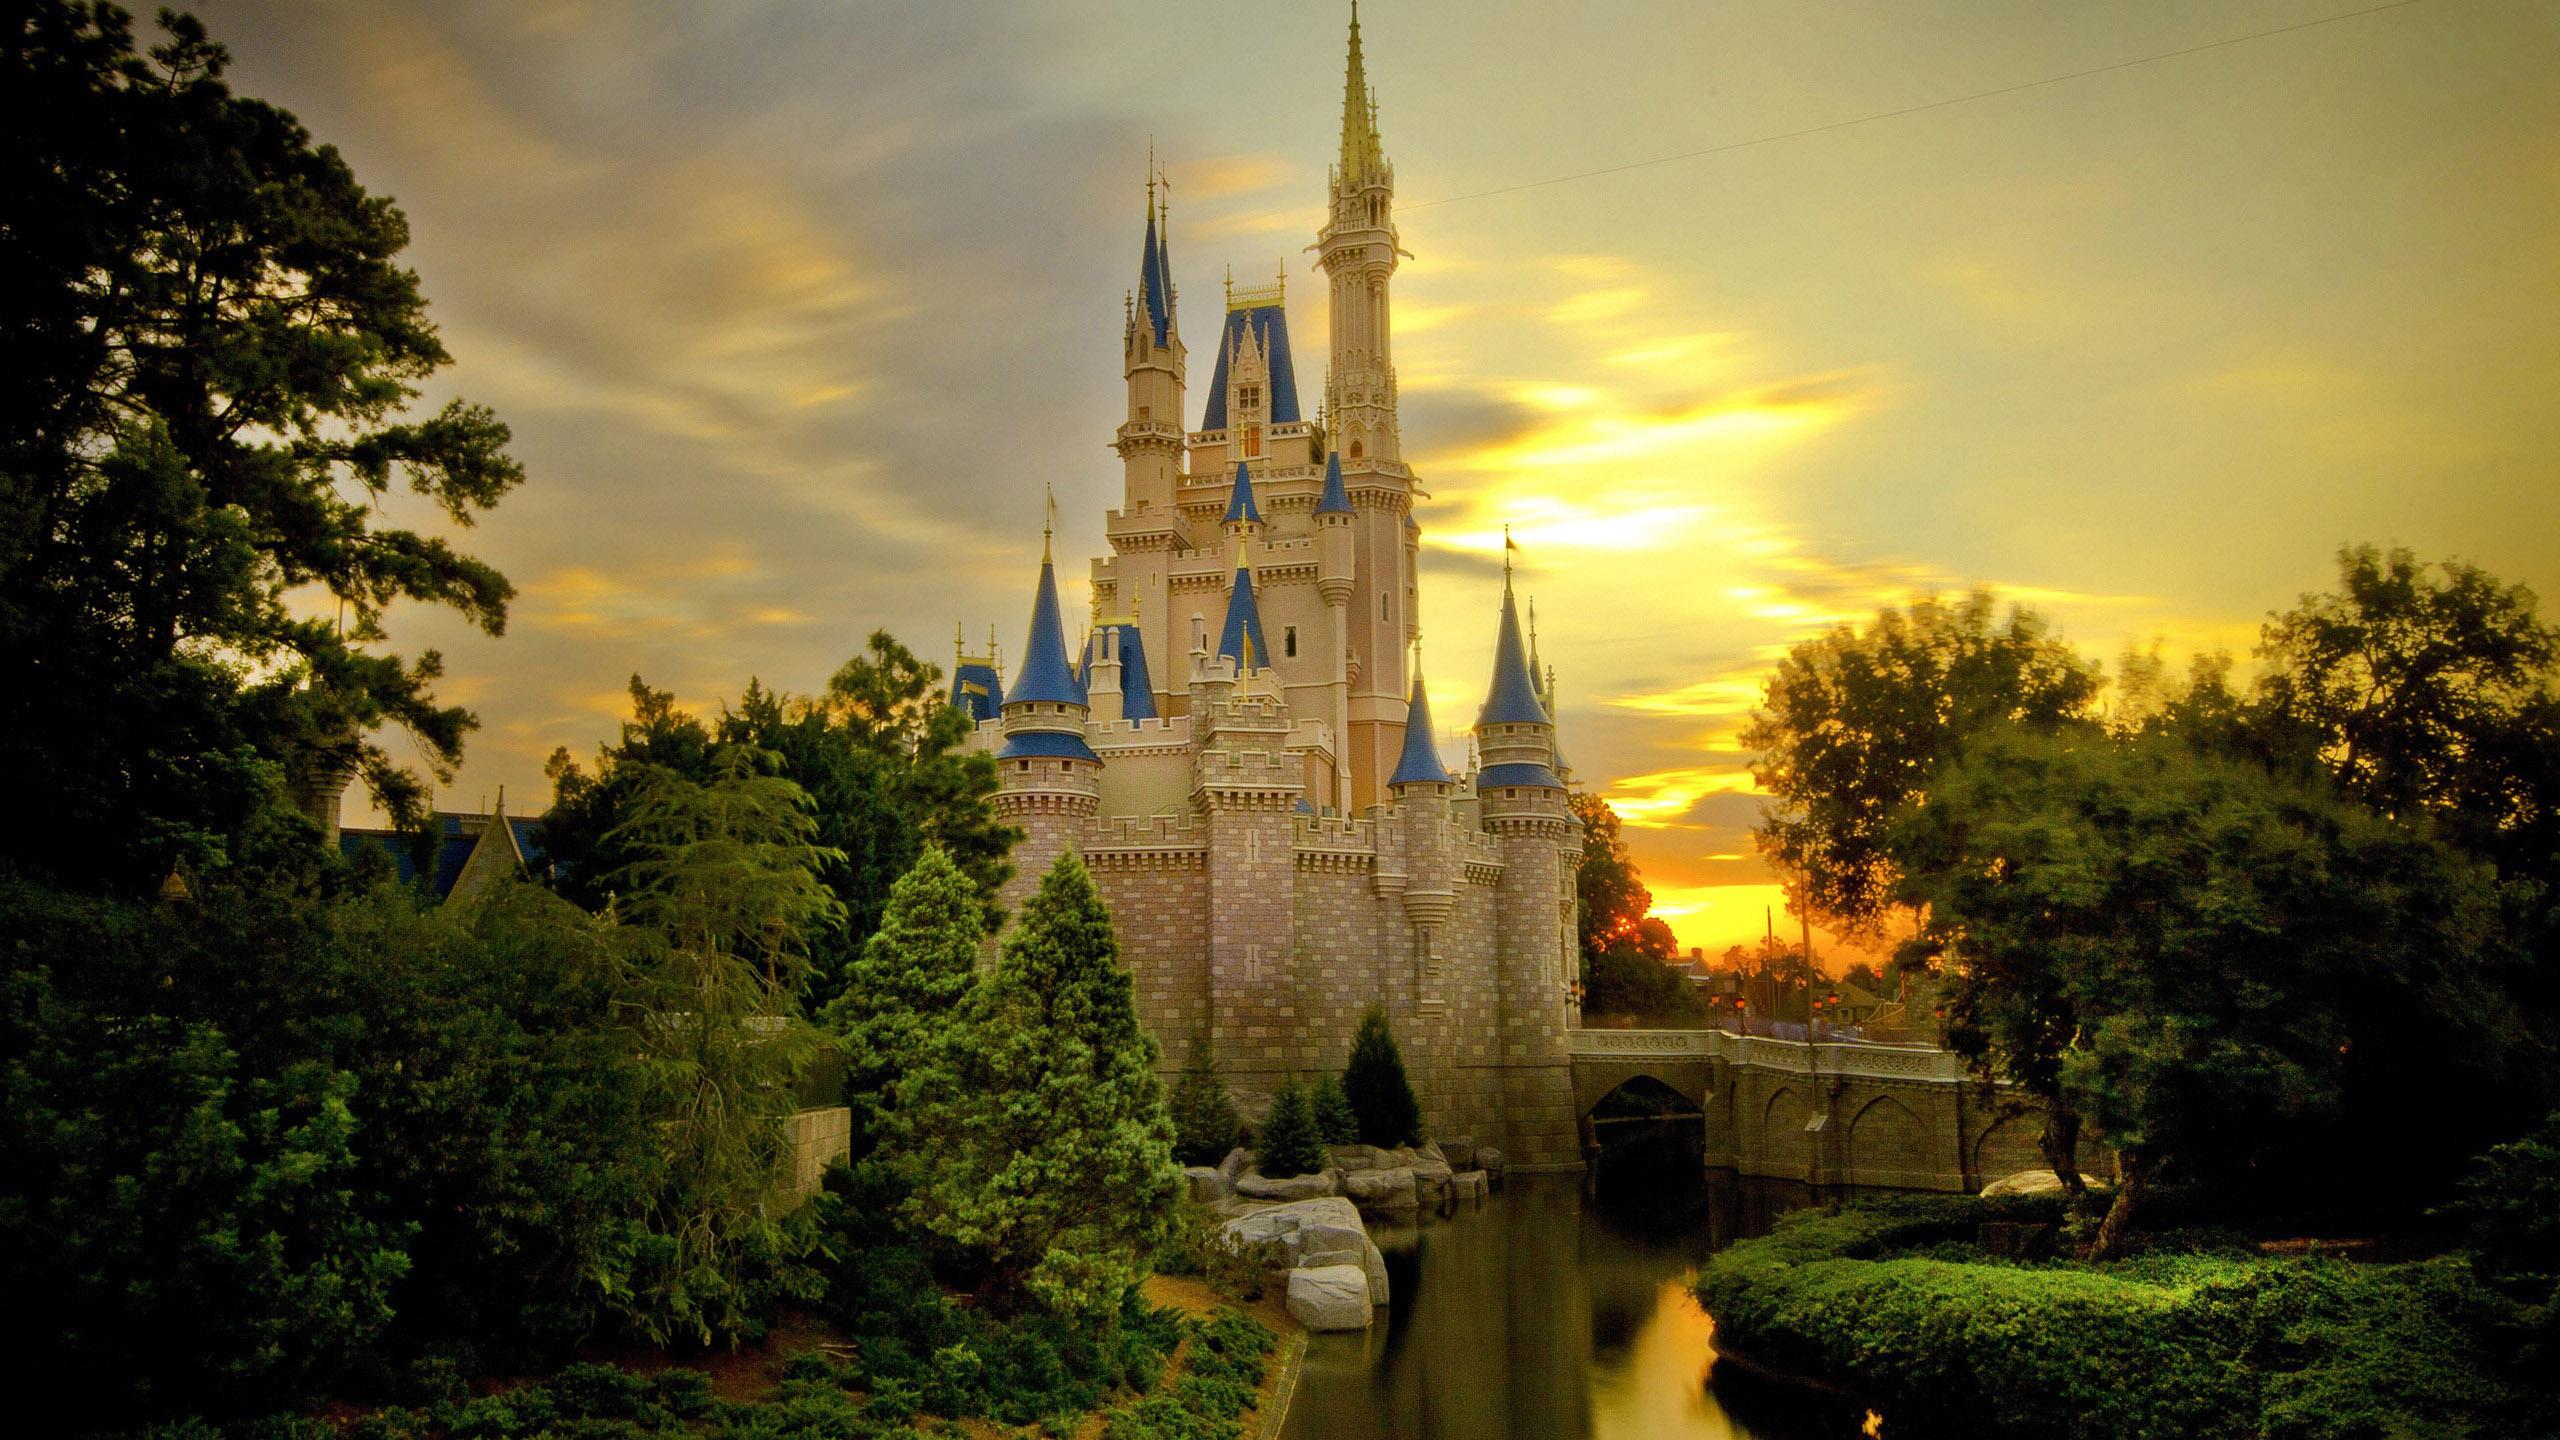 Download Disney Castle Backgrounds 2560x1440